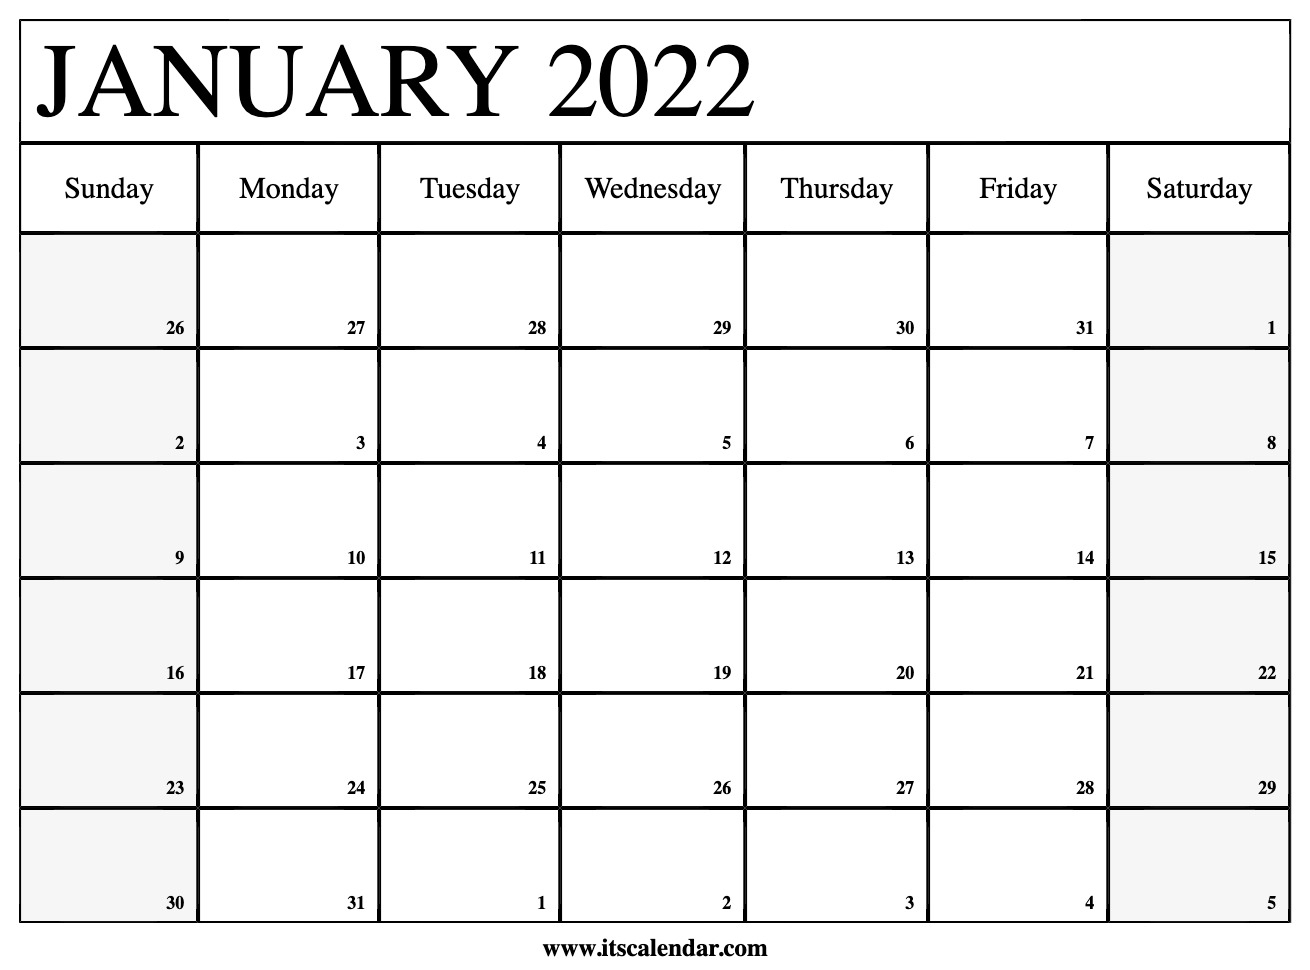 Free Printable January 2022 Calendar With Regard To Printable Calendars January 2022 To December 2022